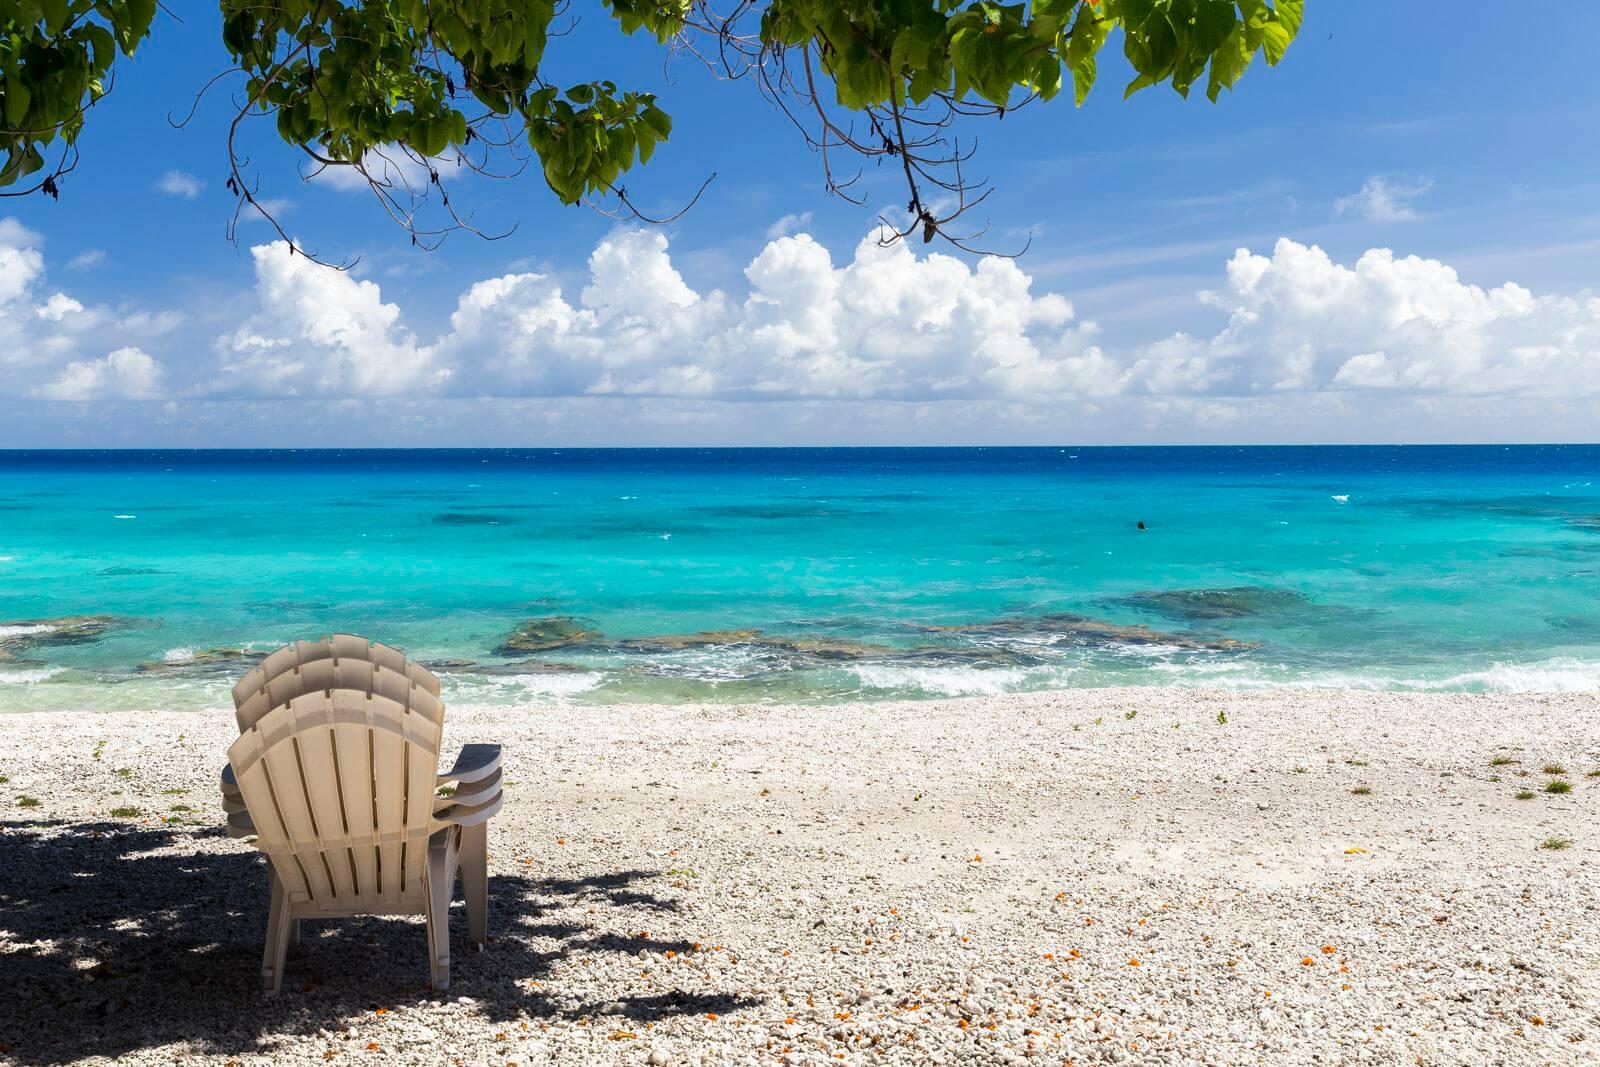 rangiroa un atol des tuamotu en polynésie française